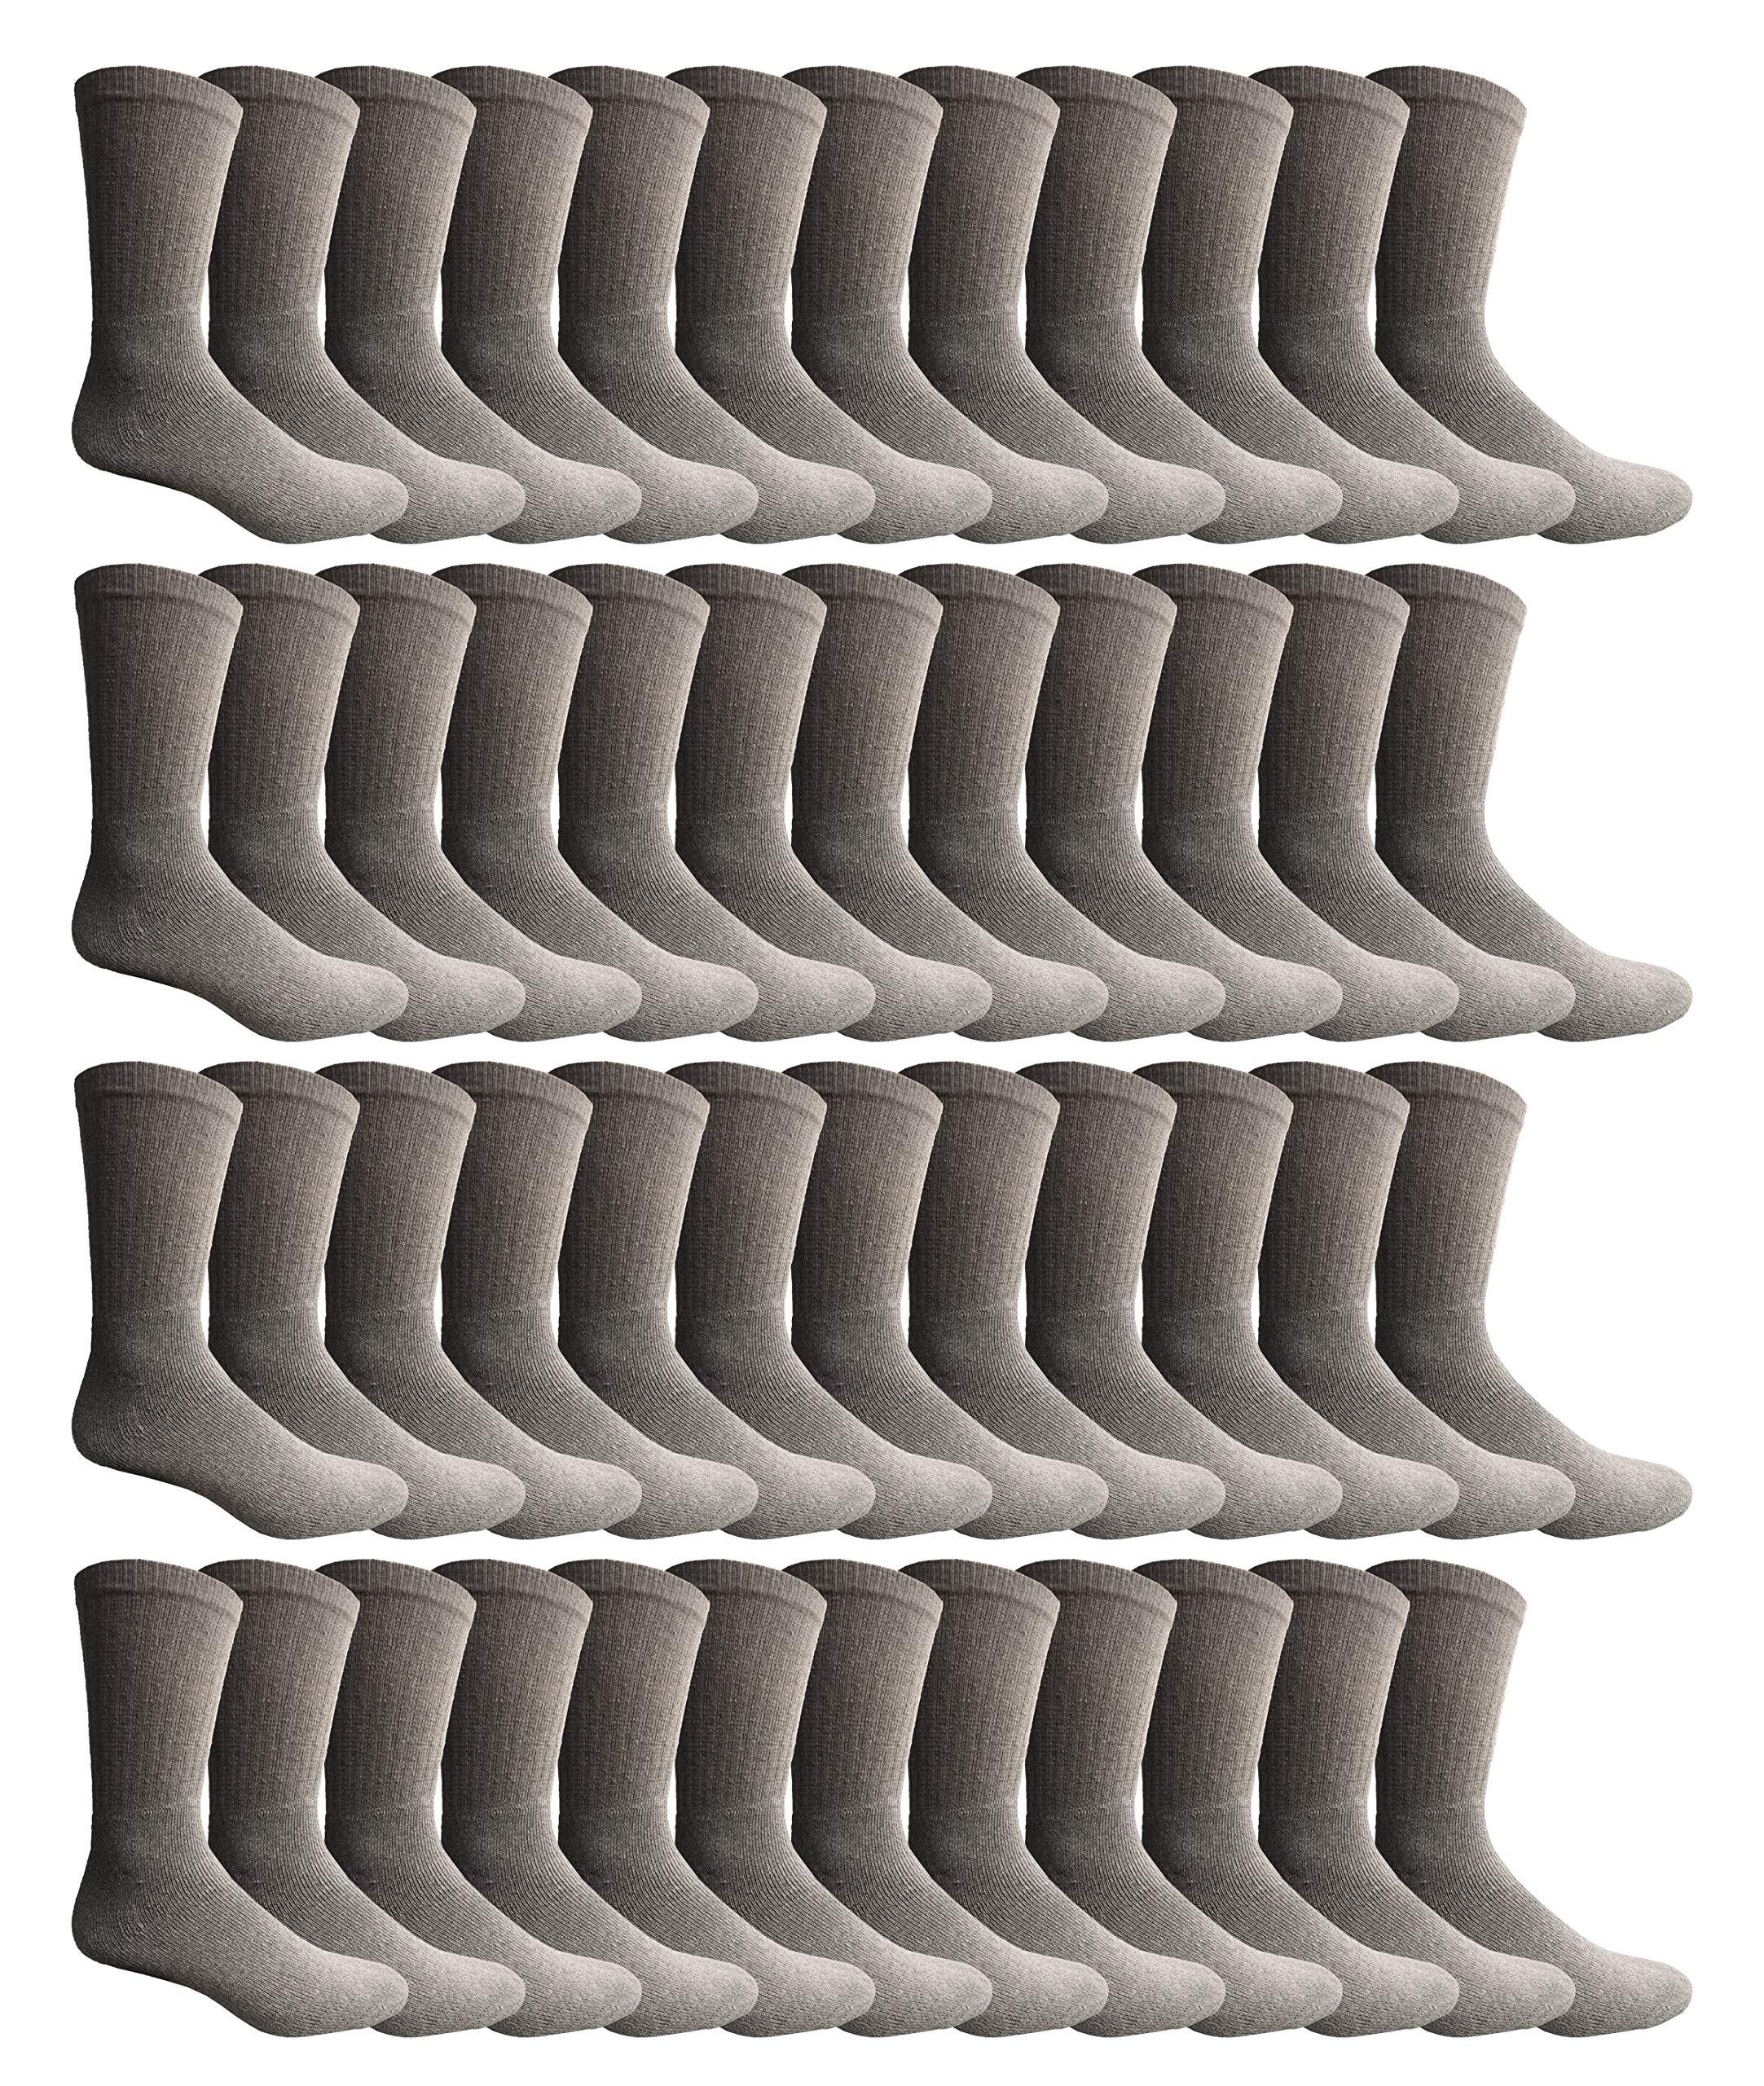 Yacht & Smith 60 Pairs of Kids Sports Crew Socks, Wholesale Bulk Pack Sock for Boys & Girls, by SOCKS'NBULK (6-8 Boys, Gray) by Yacht & Smith